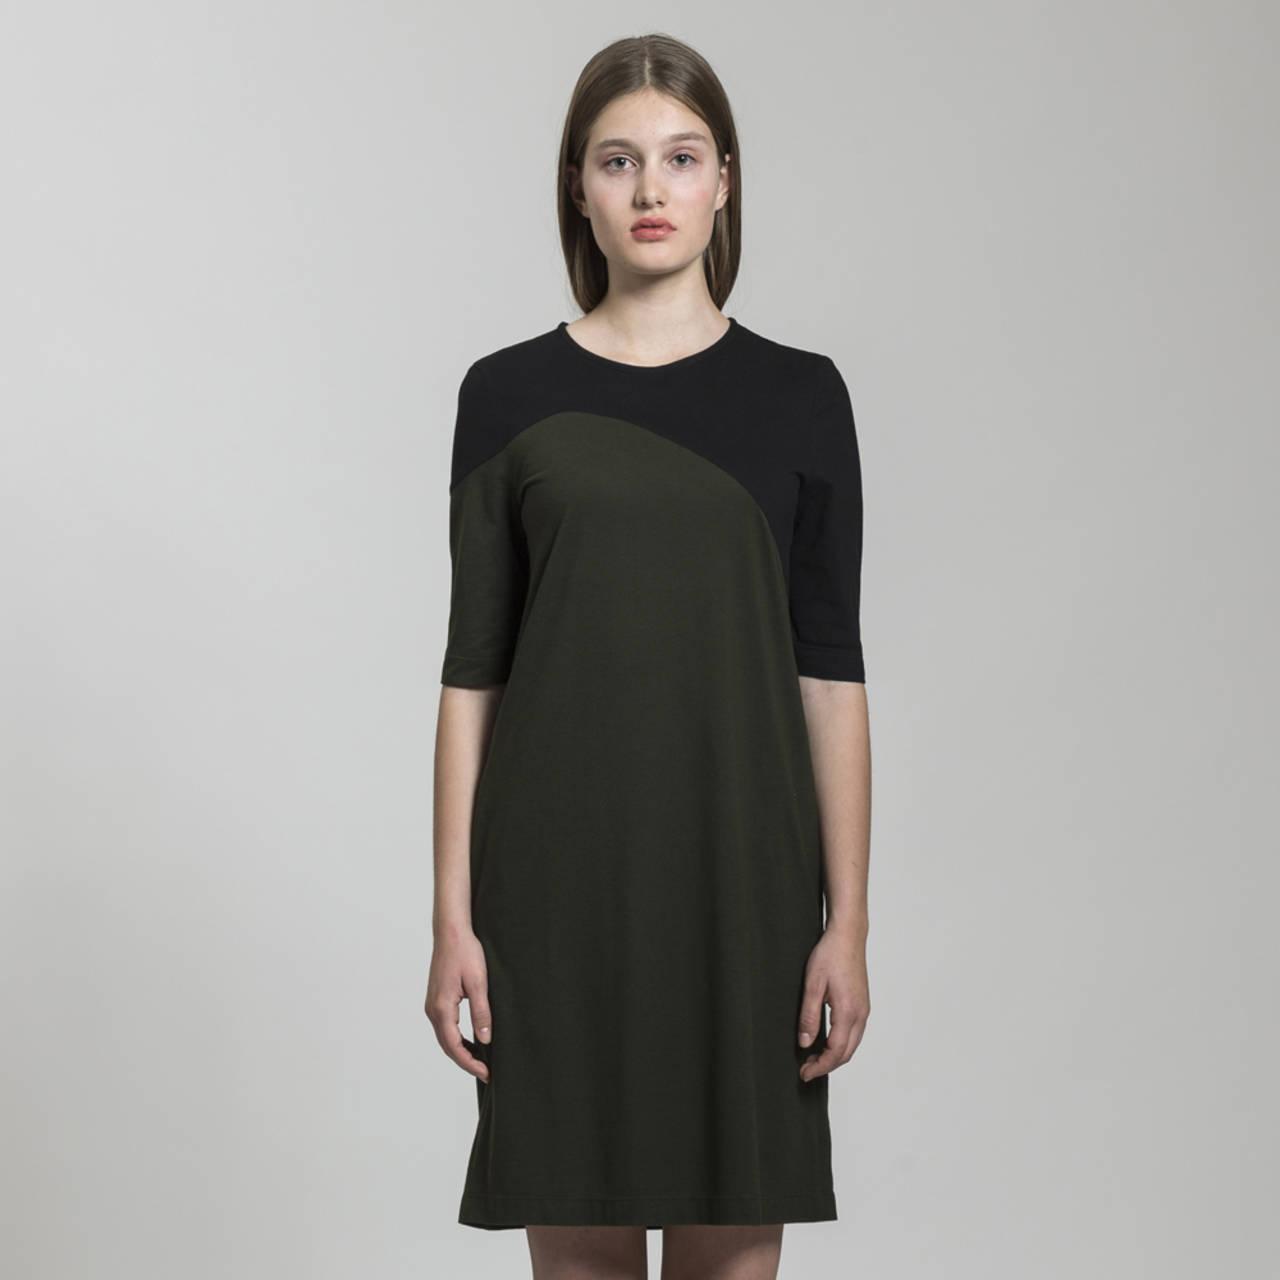 08d22802b šaty CAMO / SISTERSCONSPIRACY - SAShE.sk - Handmade Šaty